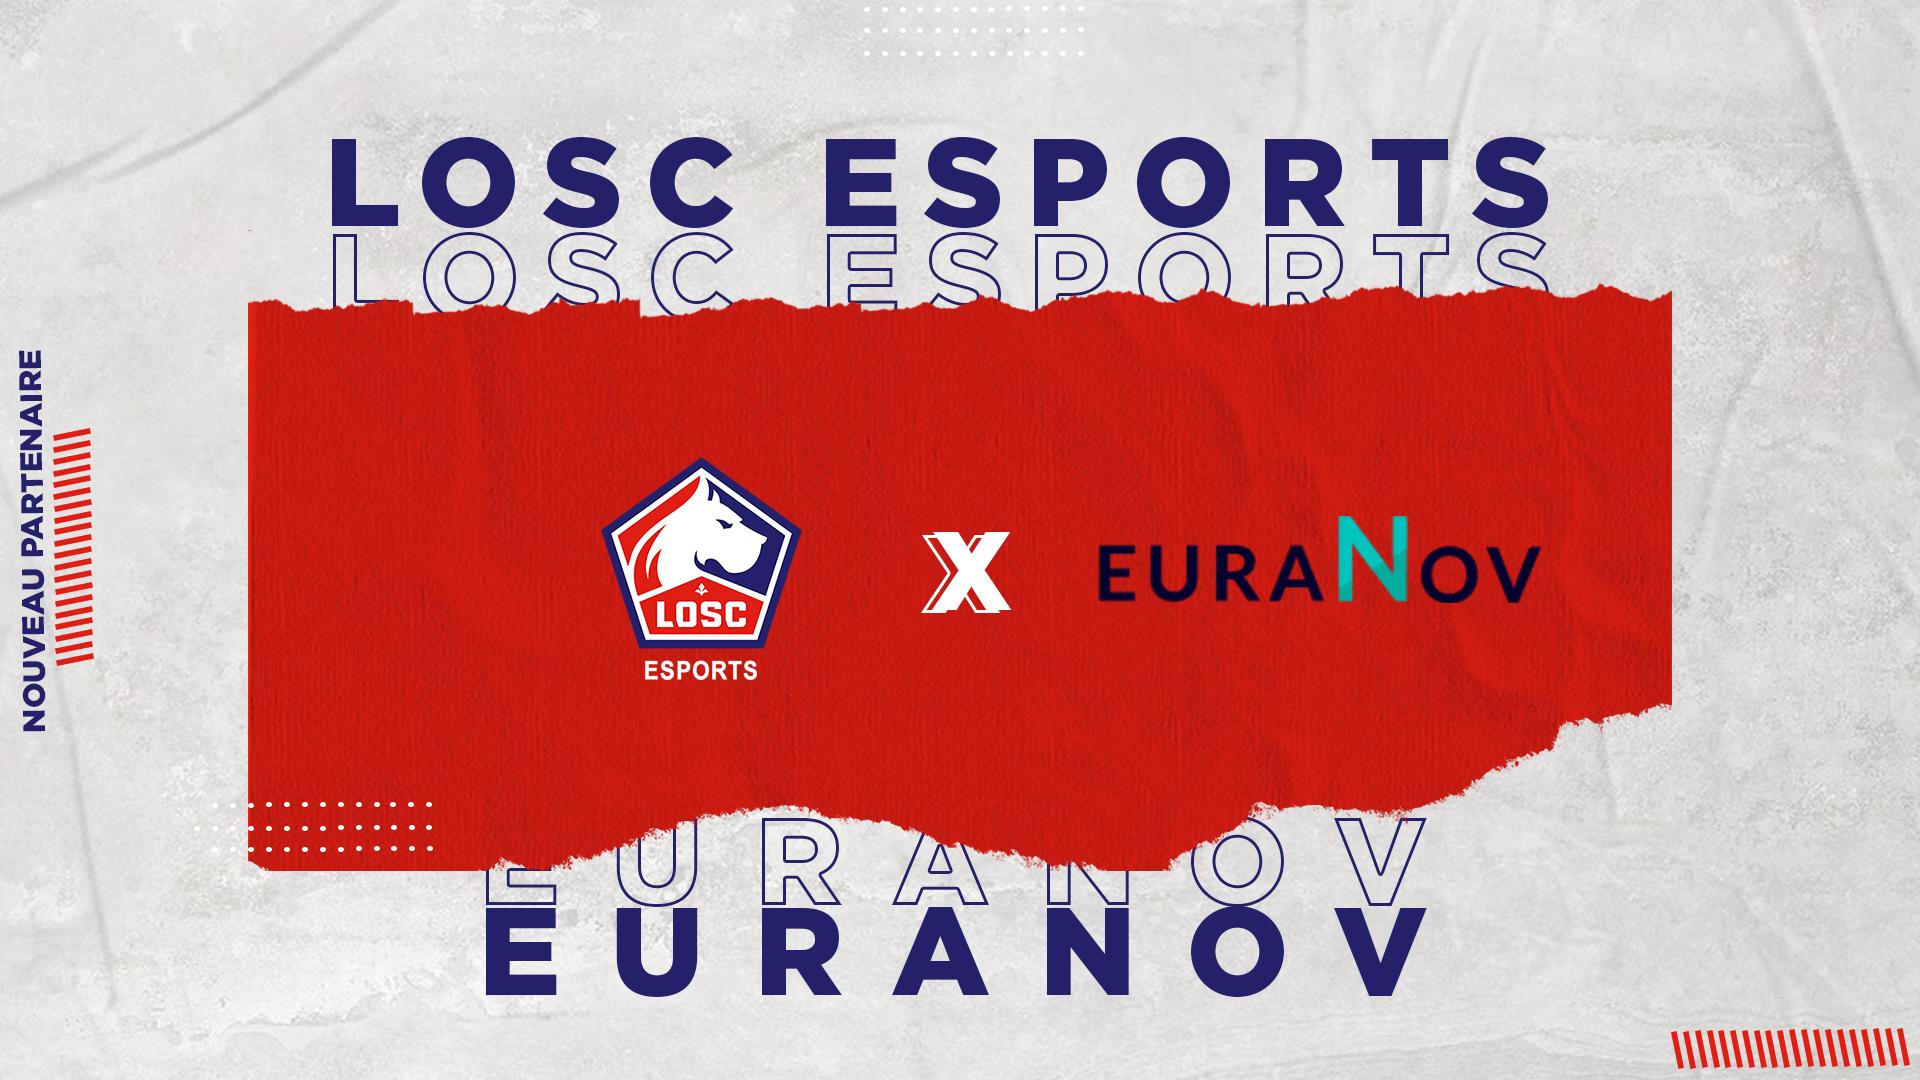 EURANOV, new member of LOSC ESPORTS